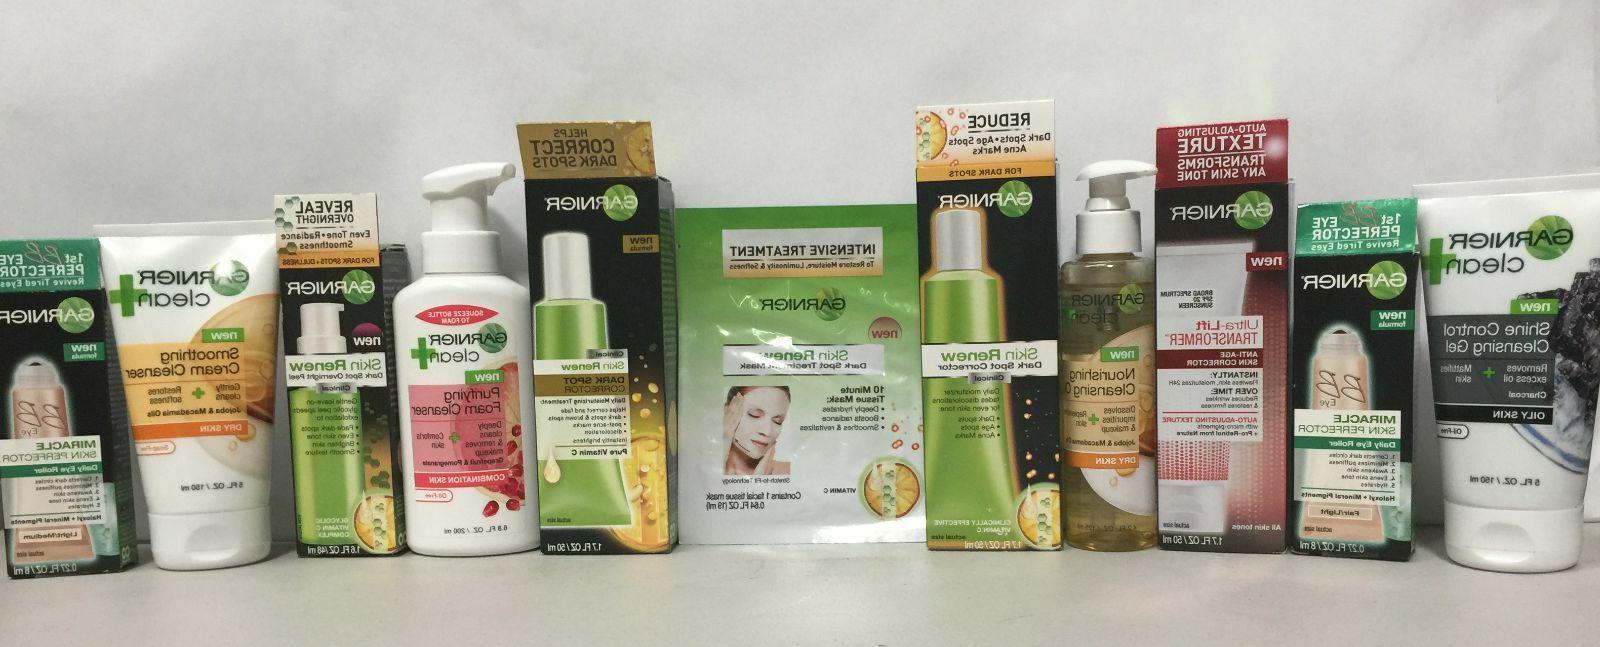 "Garnier Skin Products, Ultra Lift, BB CREAM, CLEAN +more ""Ch"